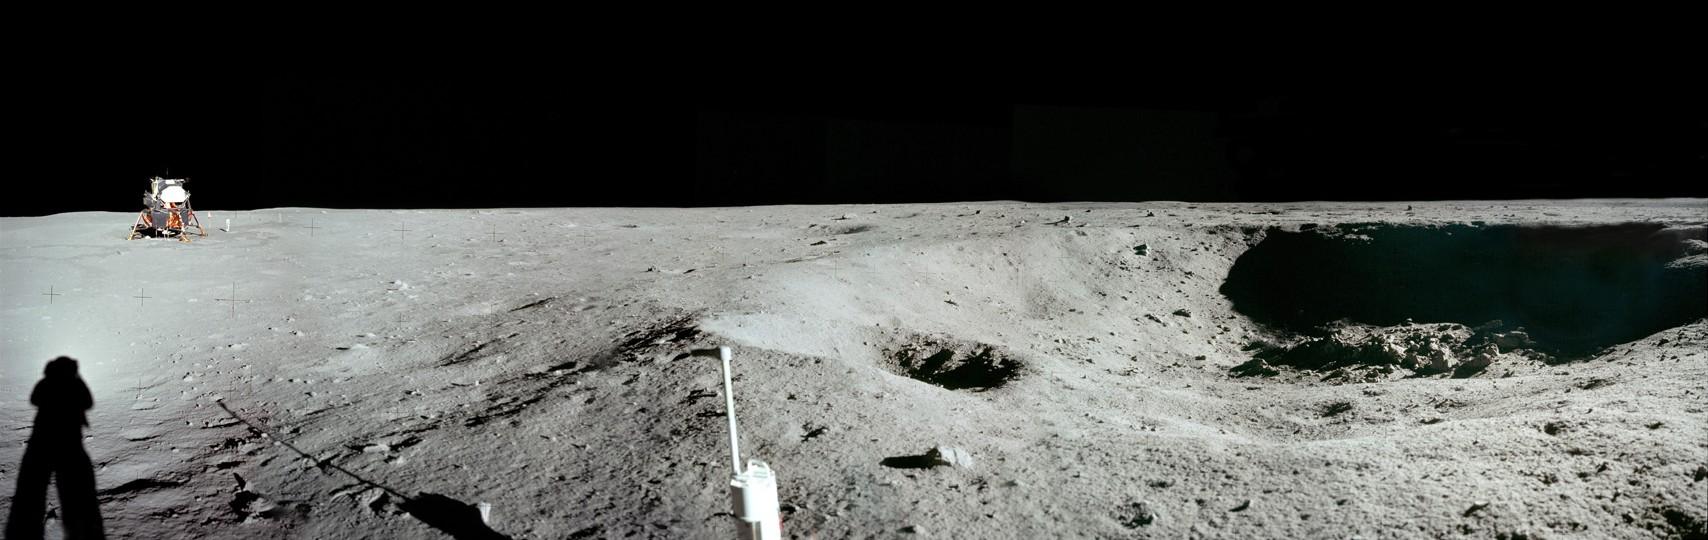 Man's diagrams on the moon landing